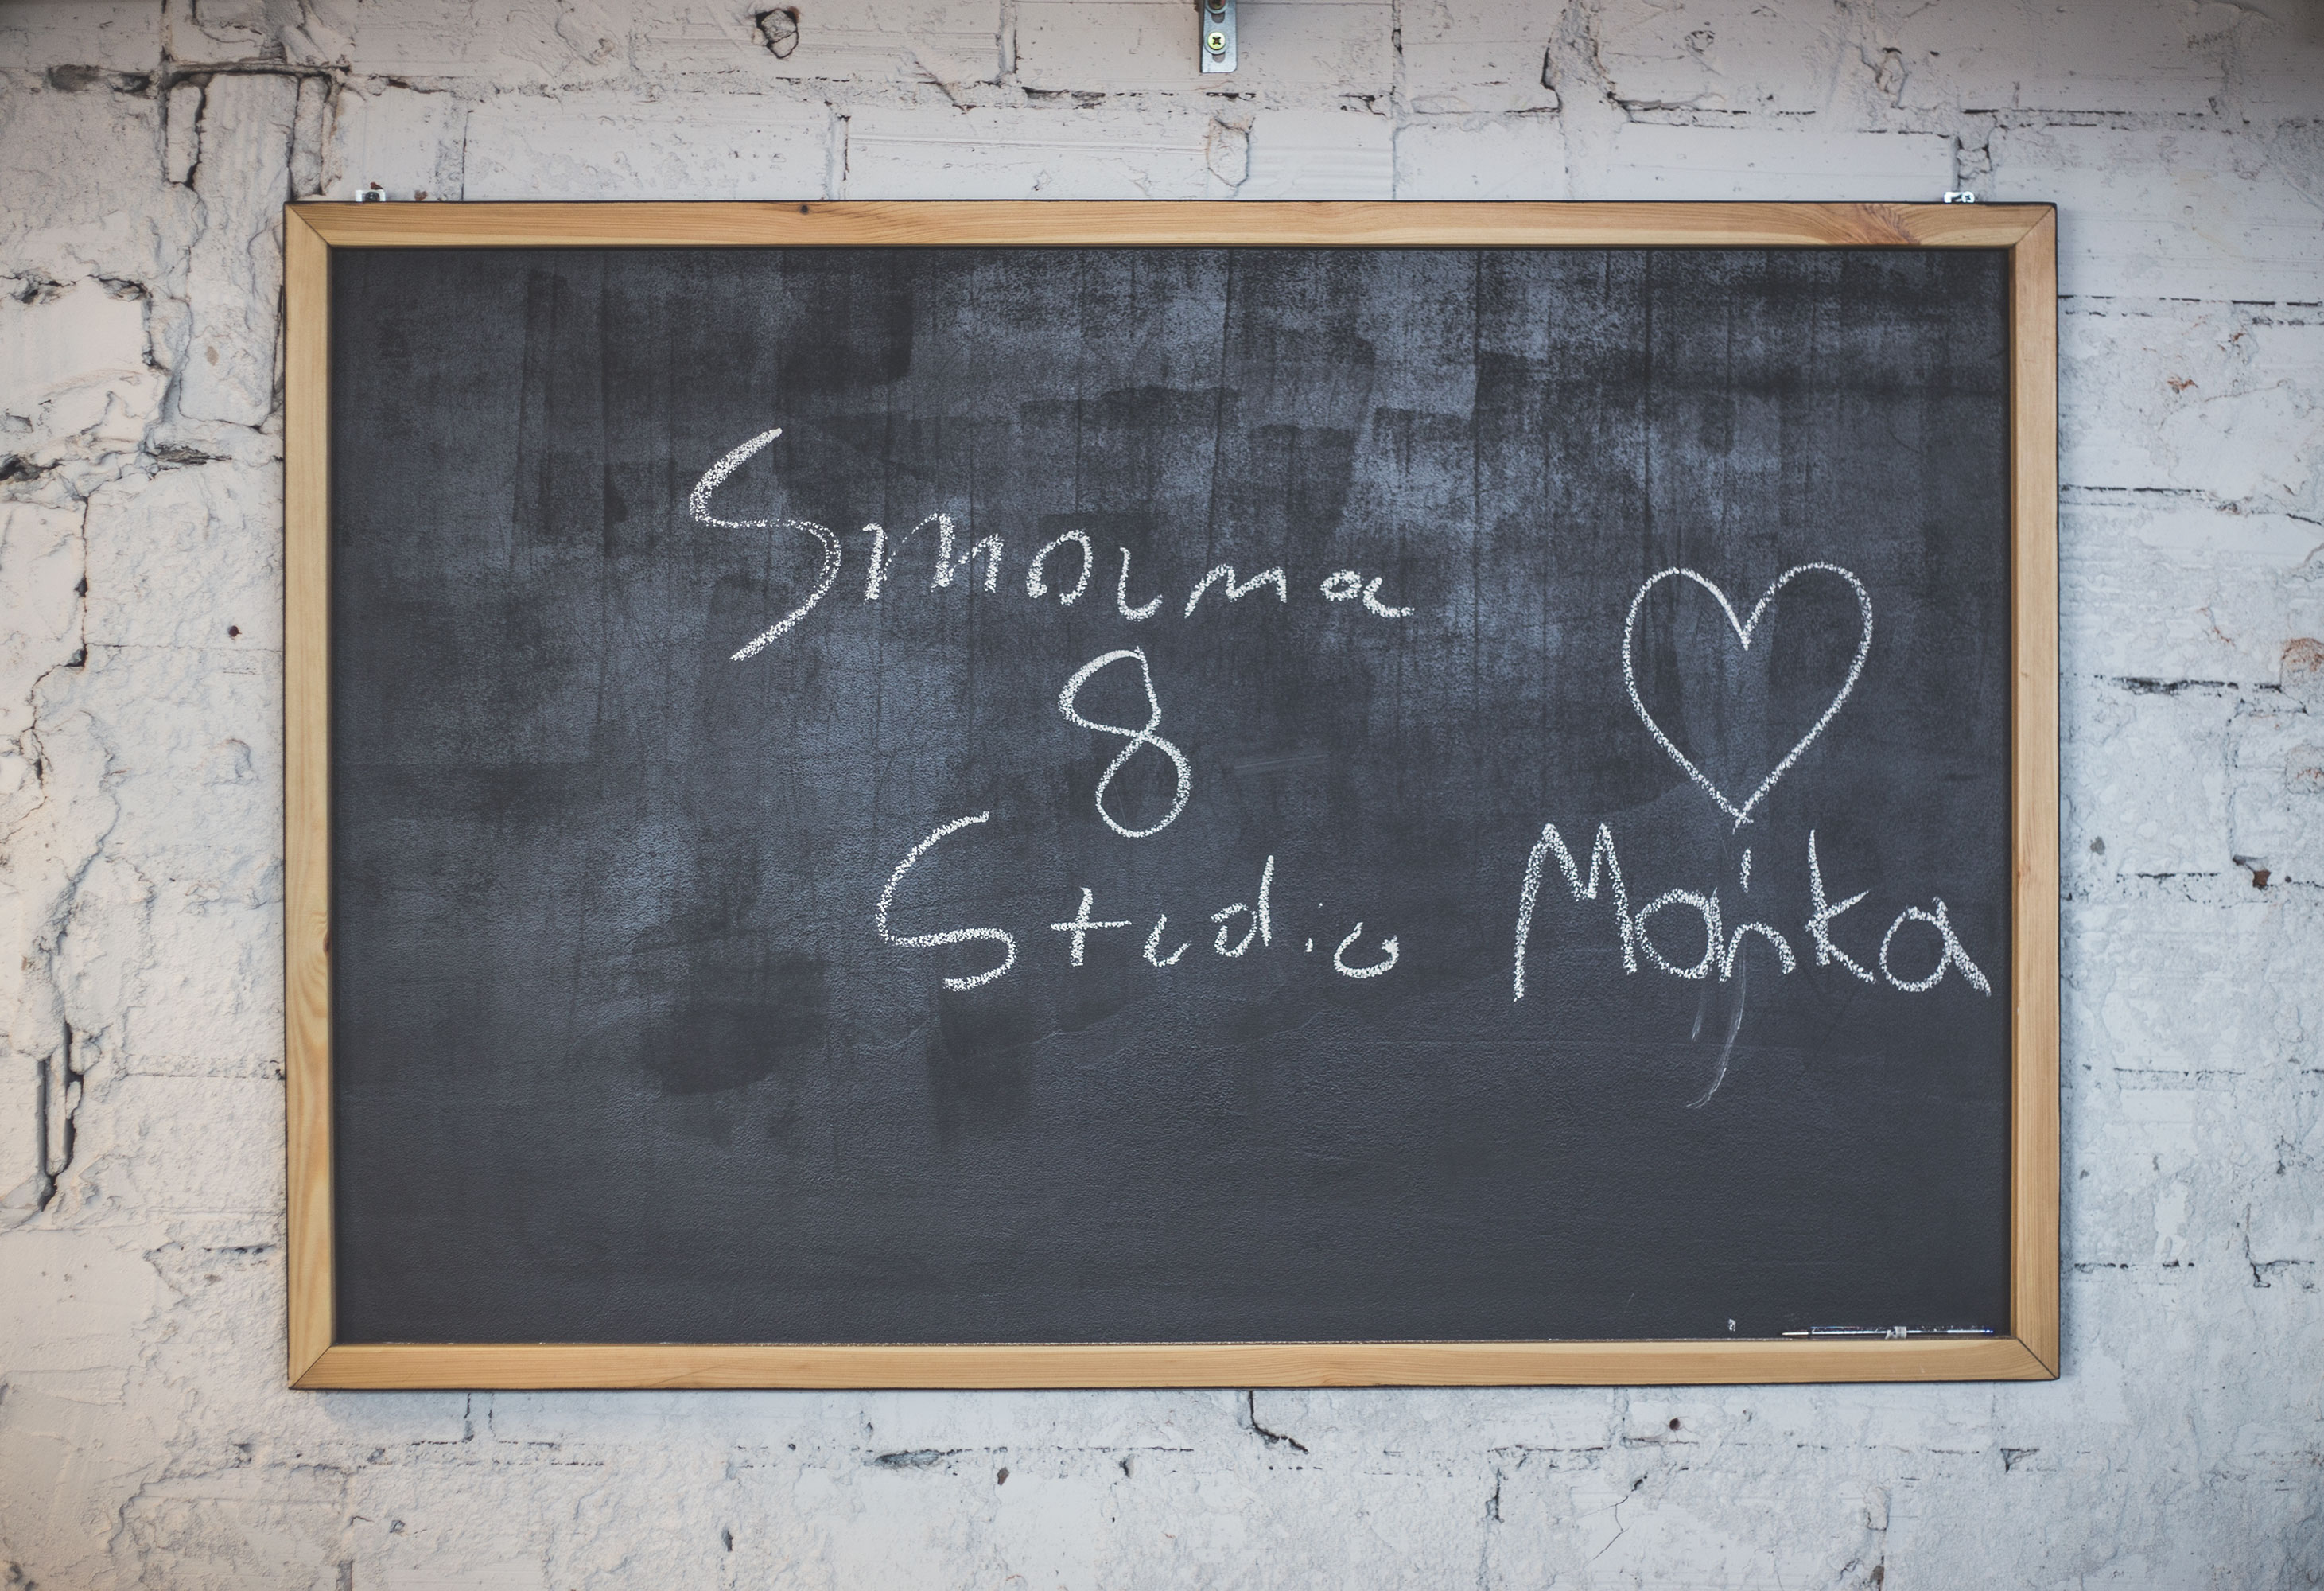 Studio 8 Smolna